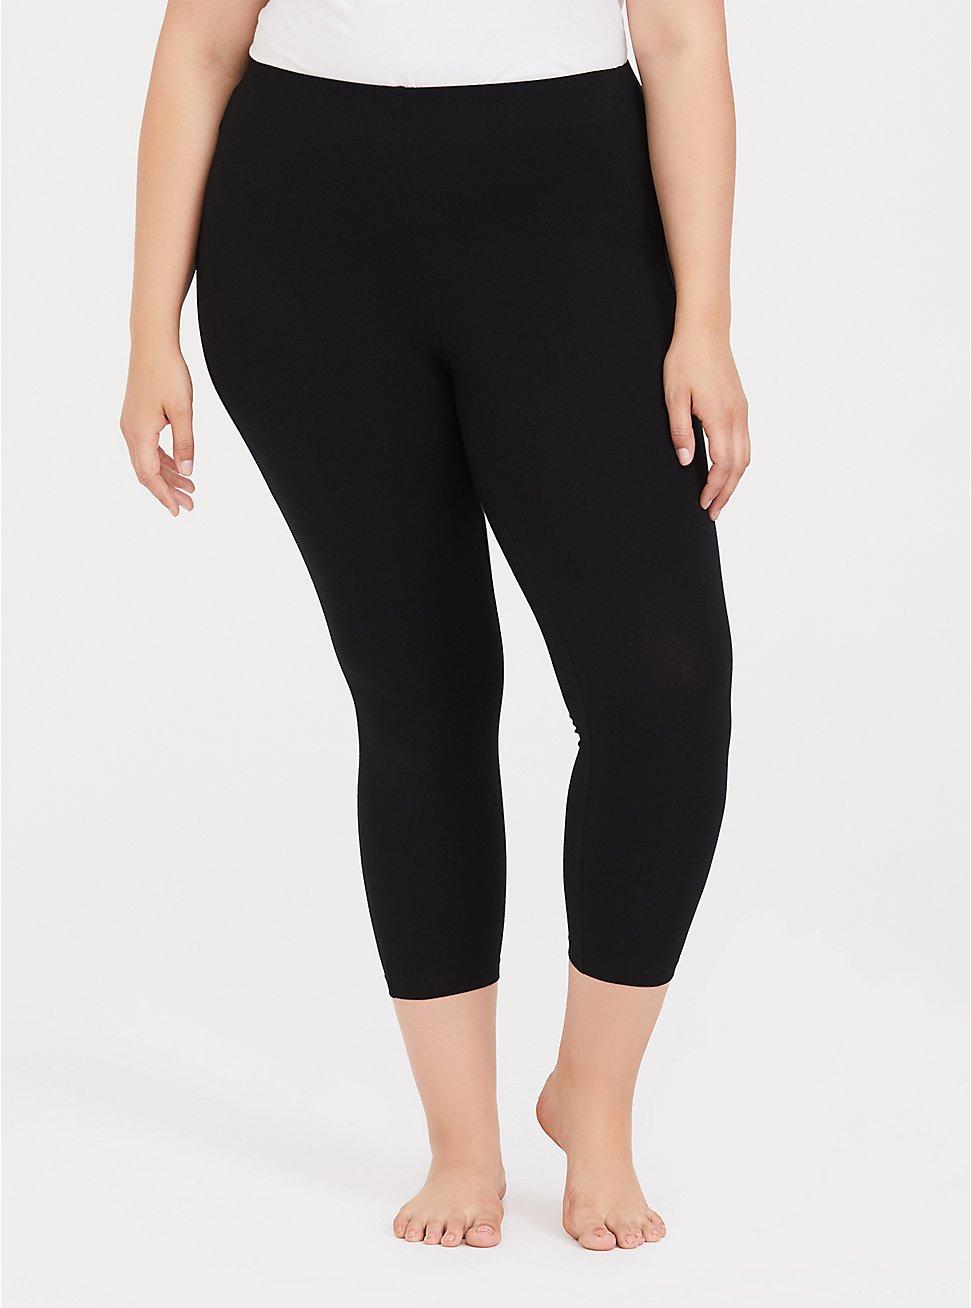 Plus Size Black Crop Sleep Legging, DEEP BLACK, hi-res